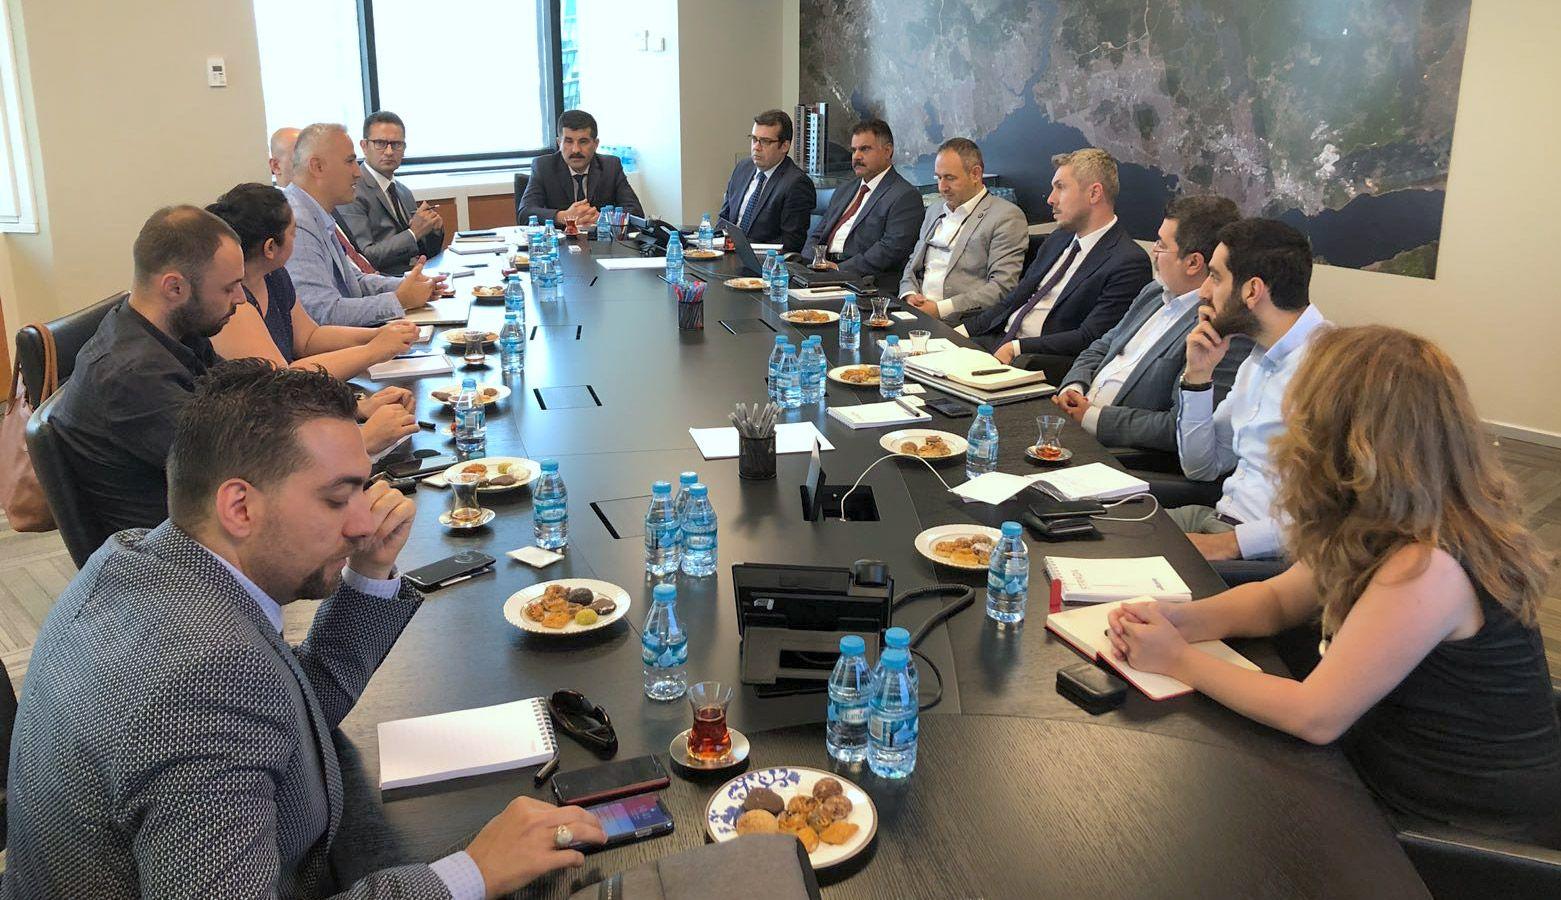 Байрам Текче Стал Председателем Комитета по Экспорту Недвижимости